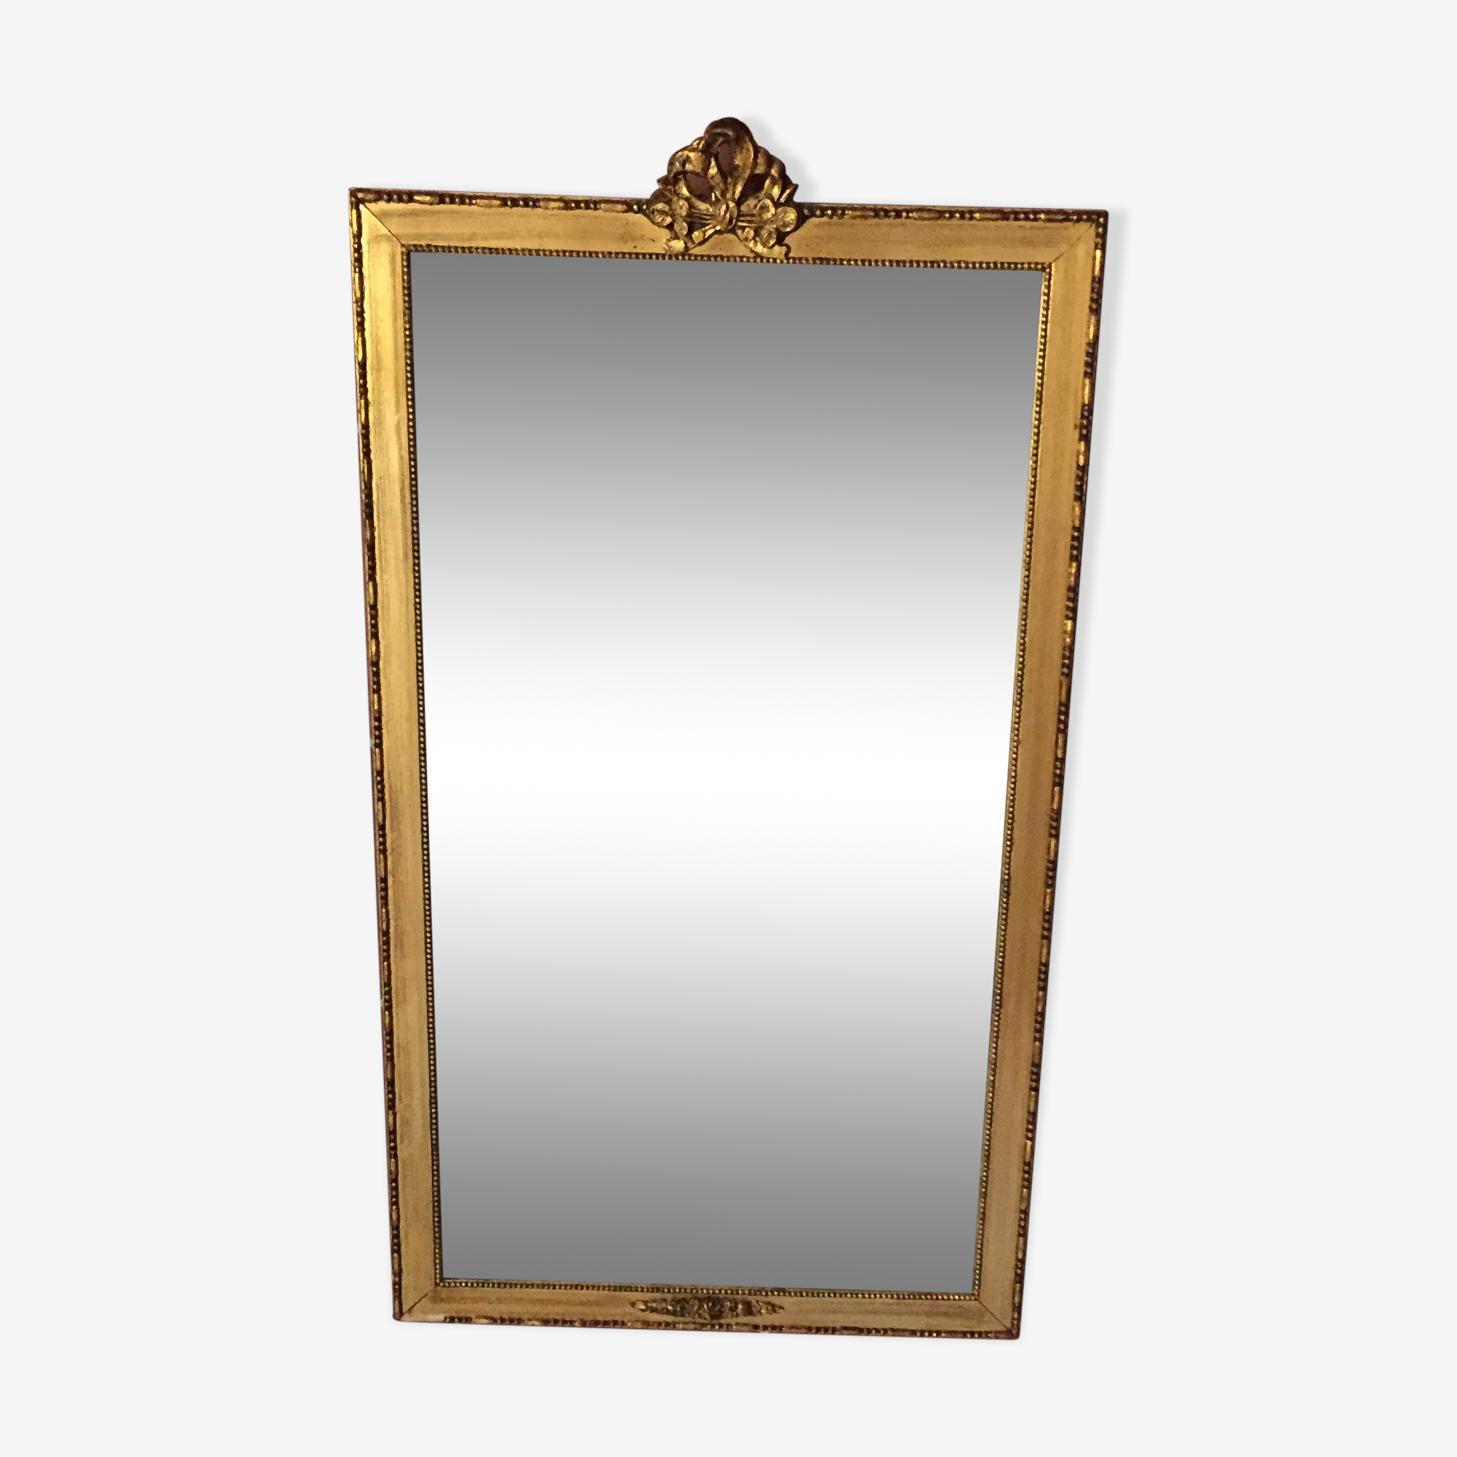 Rectangular mirror wooden gold 67 x 37 cm